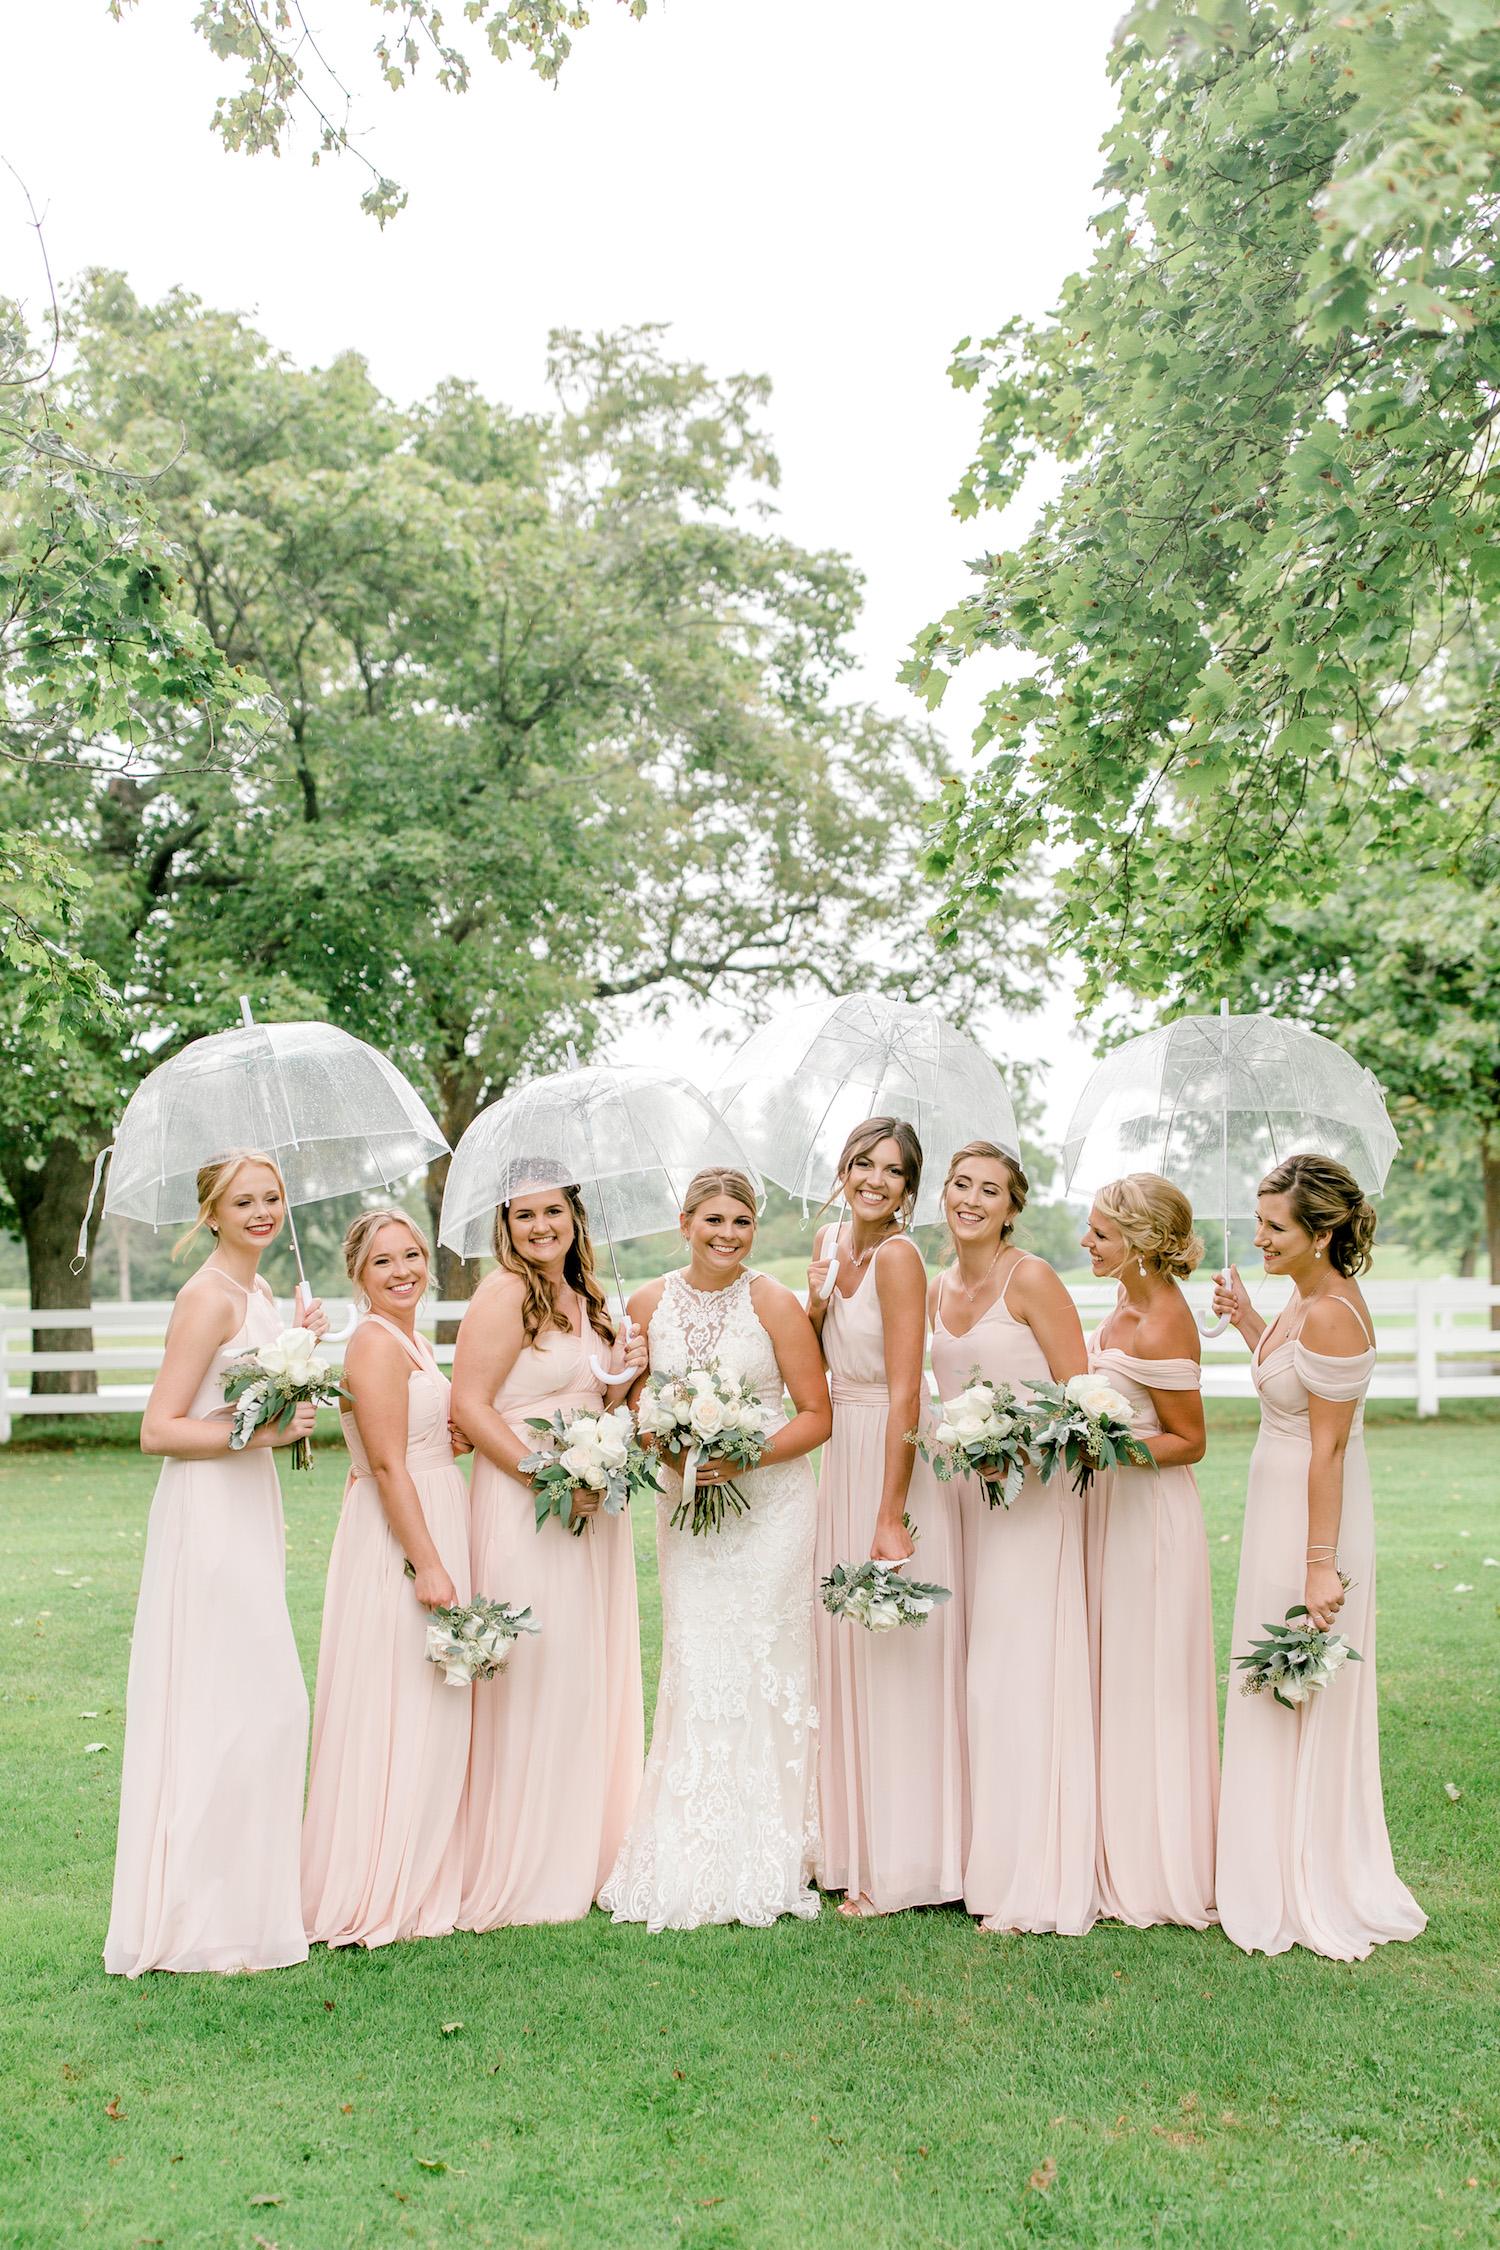 Bride and bridesmaids standing under umbrellas